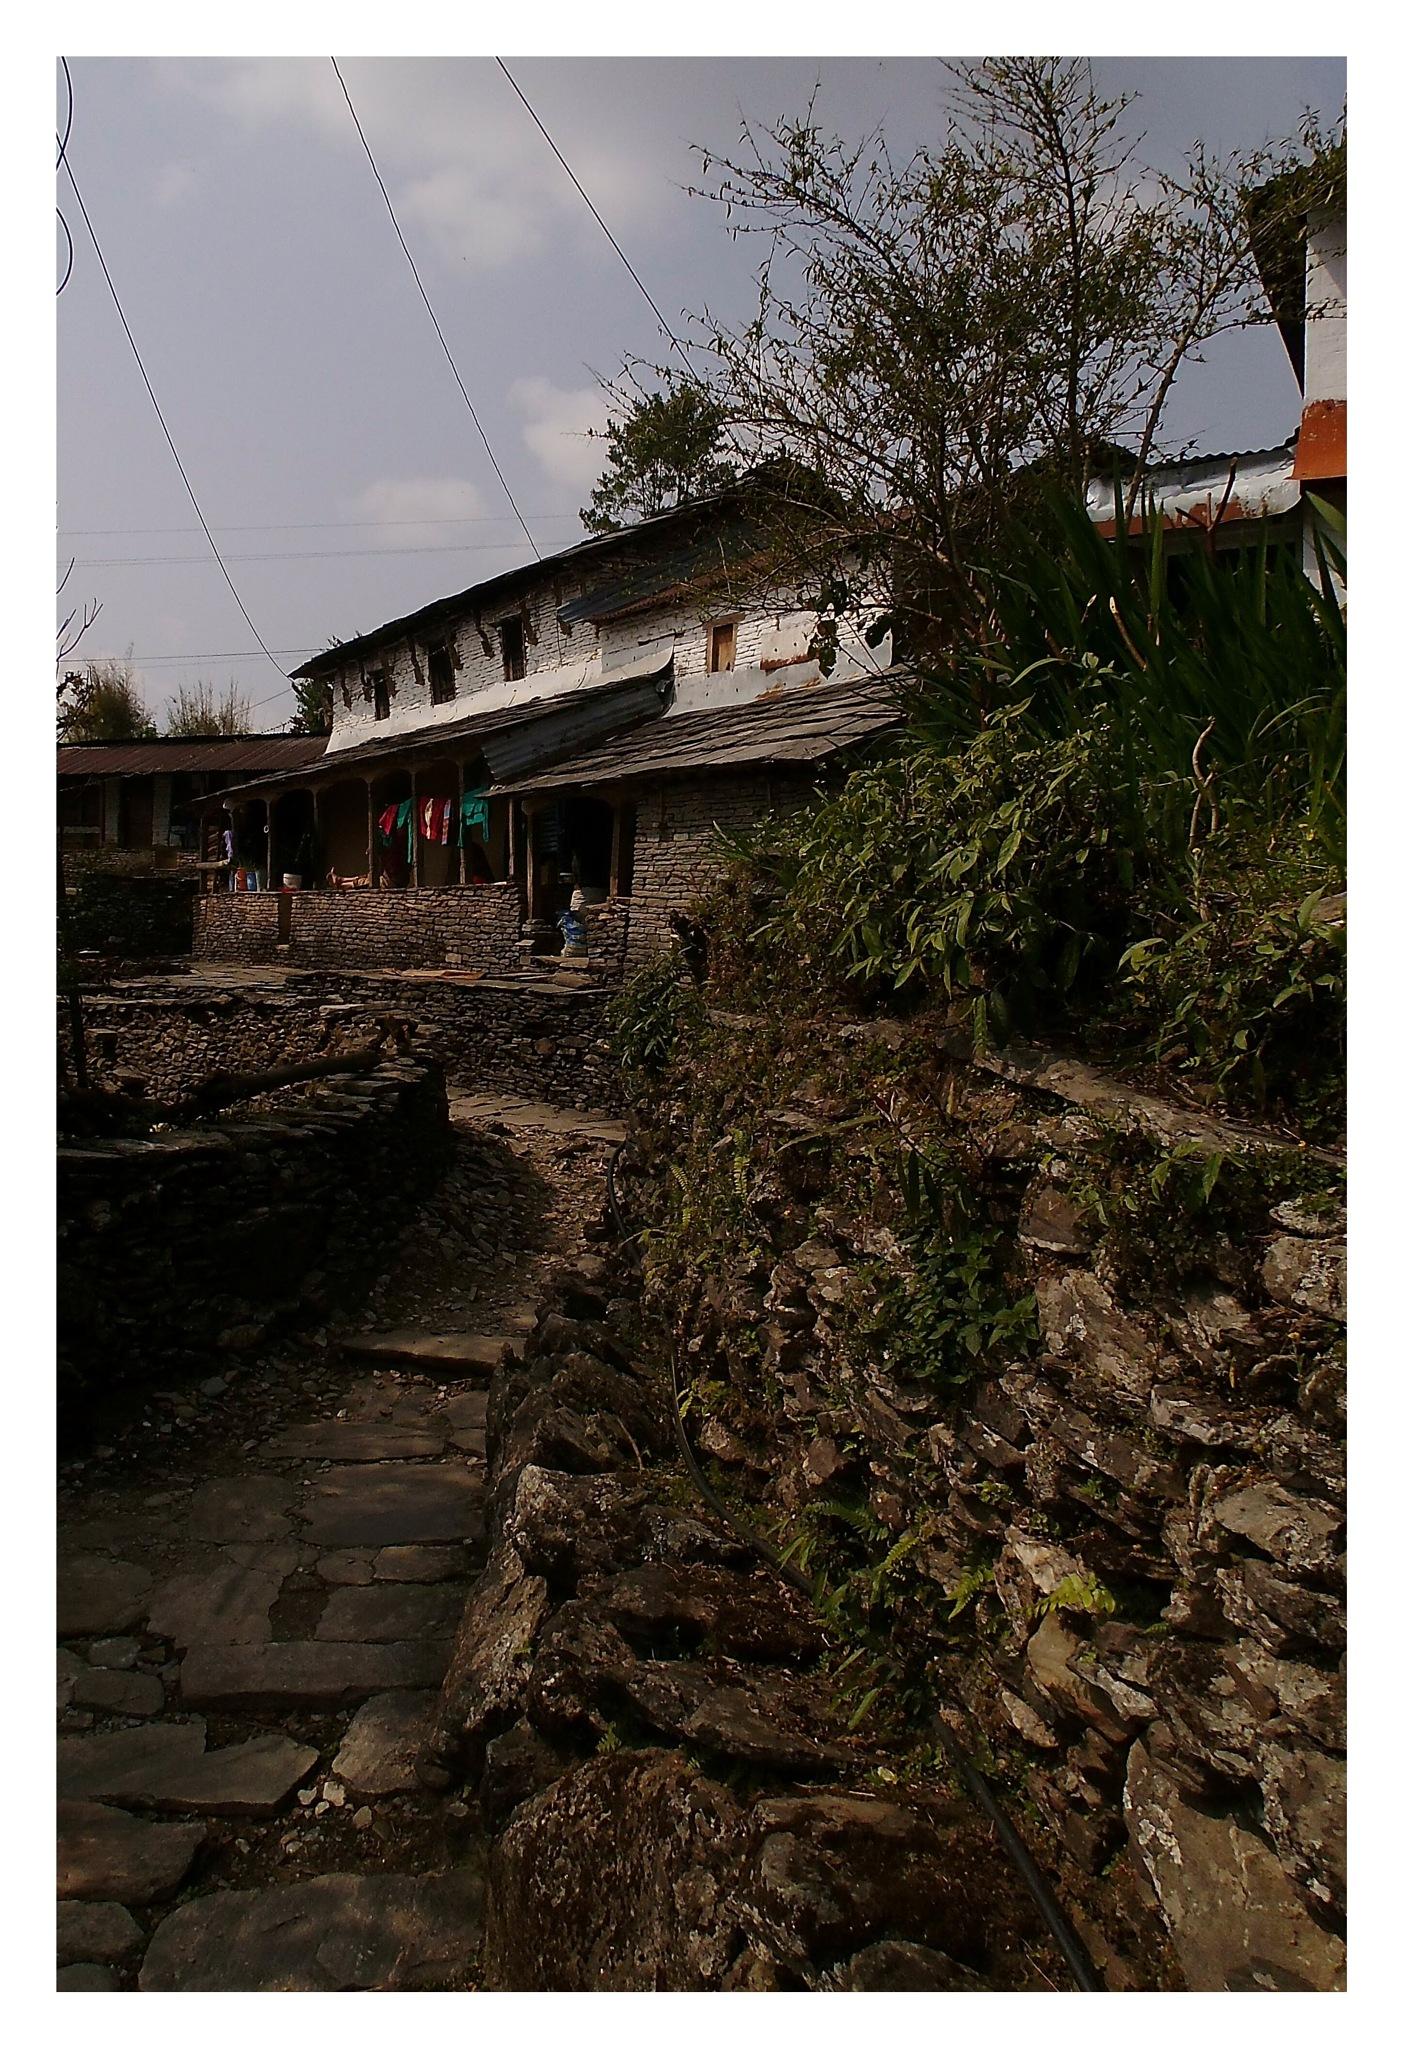 Nepalese farmhouse by Mathias Winkler